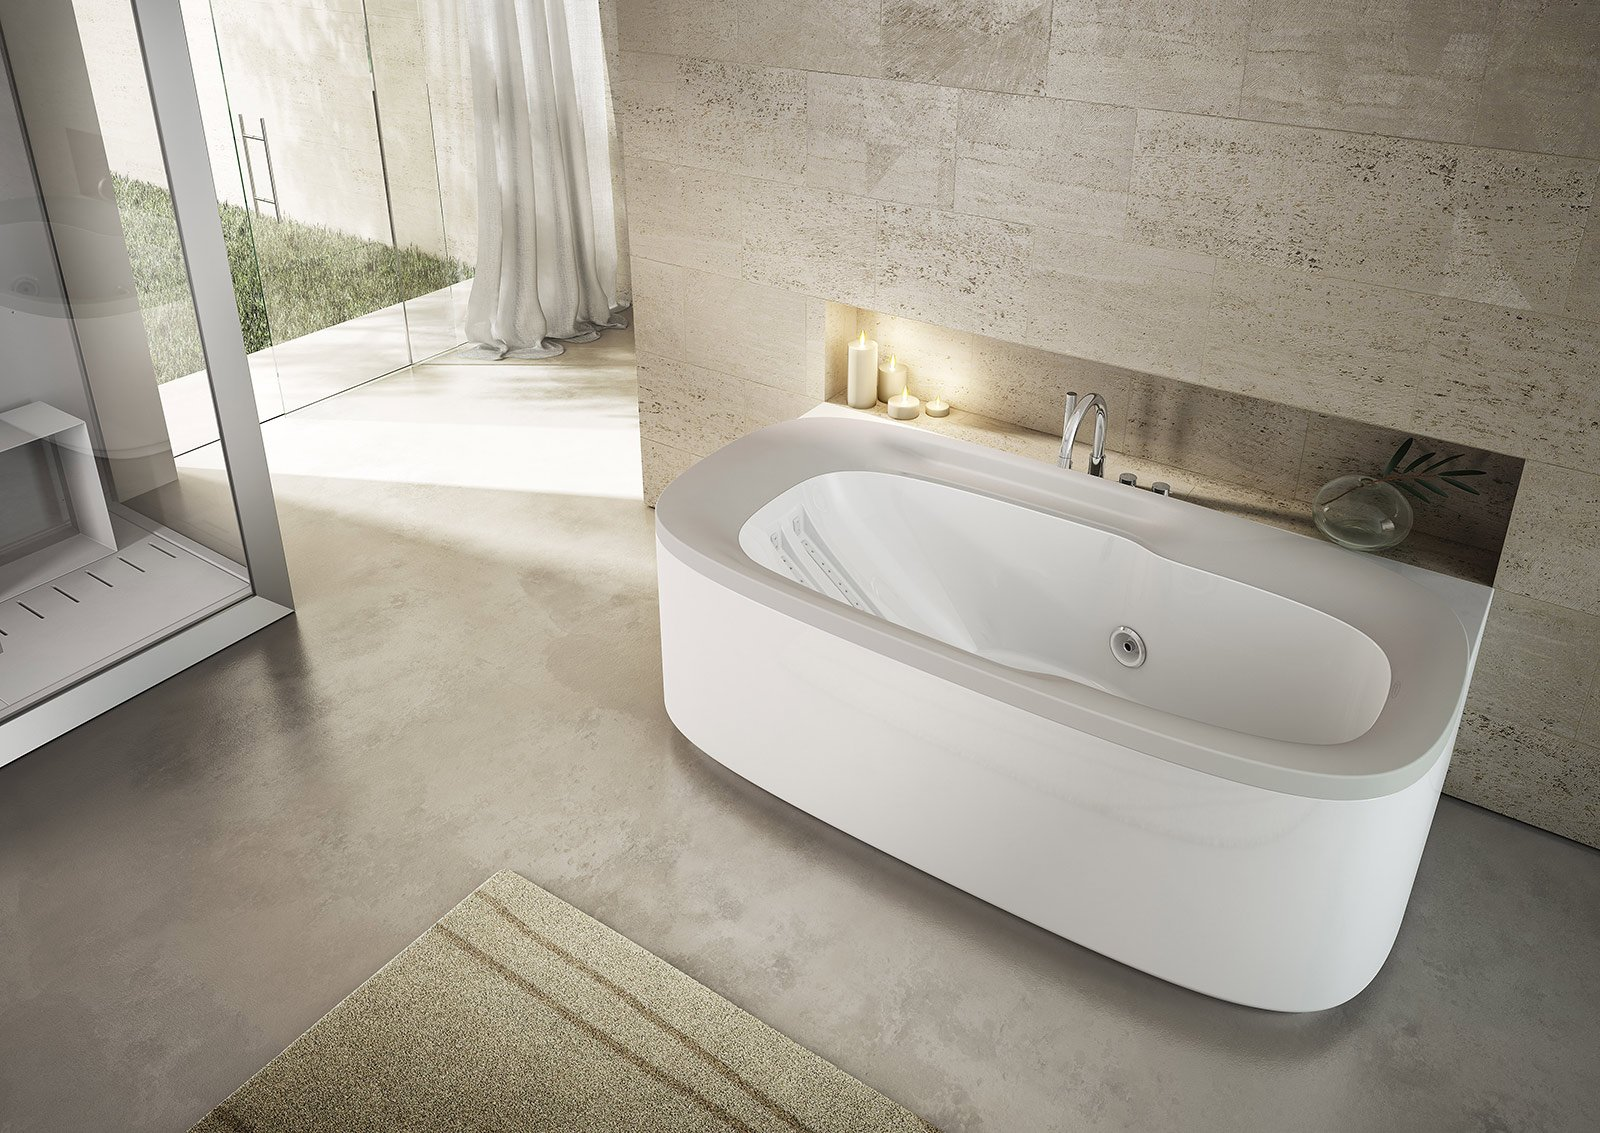 Vasche da bagno. Novità del Cersaie 2013 - Cose di Casa